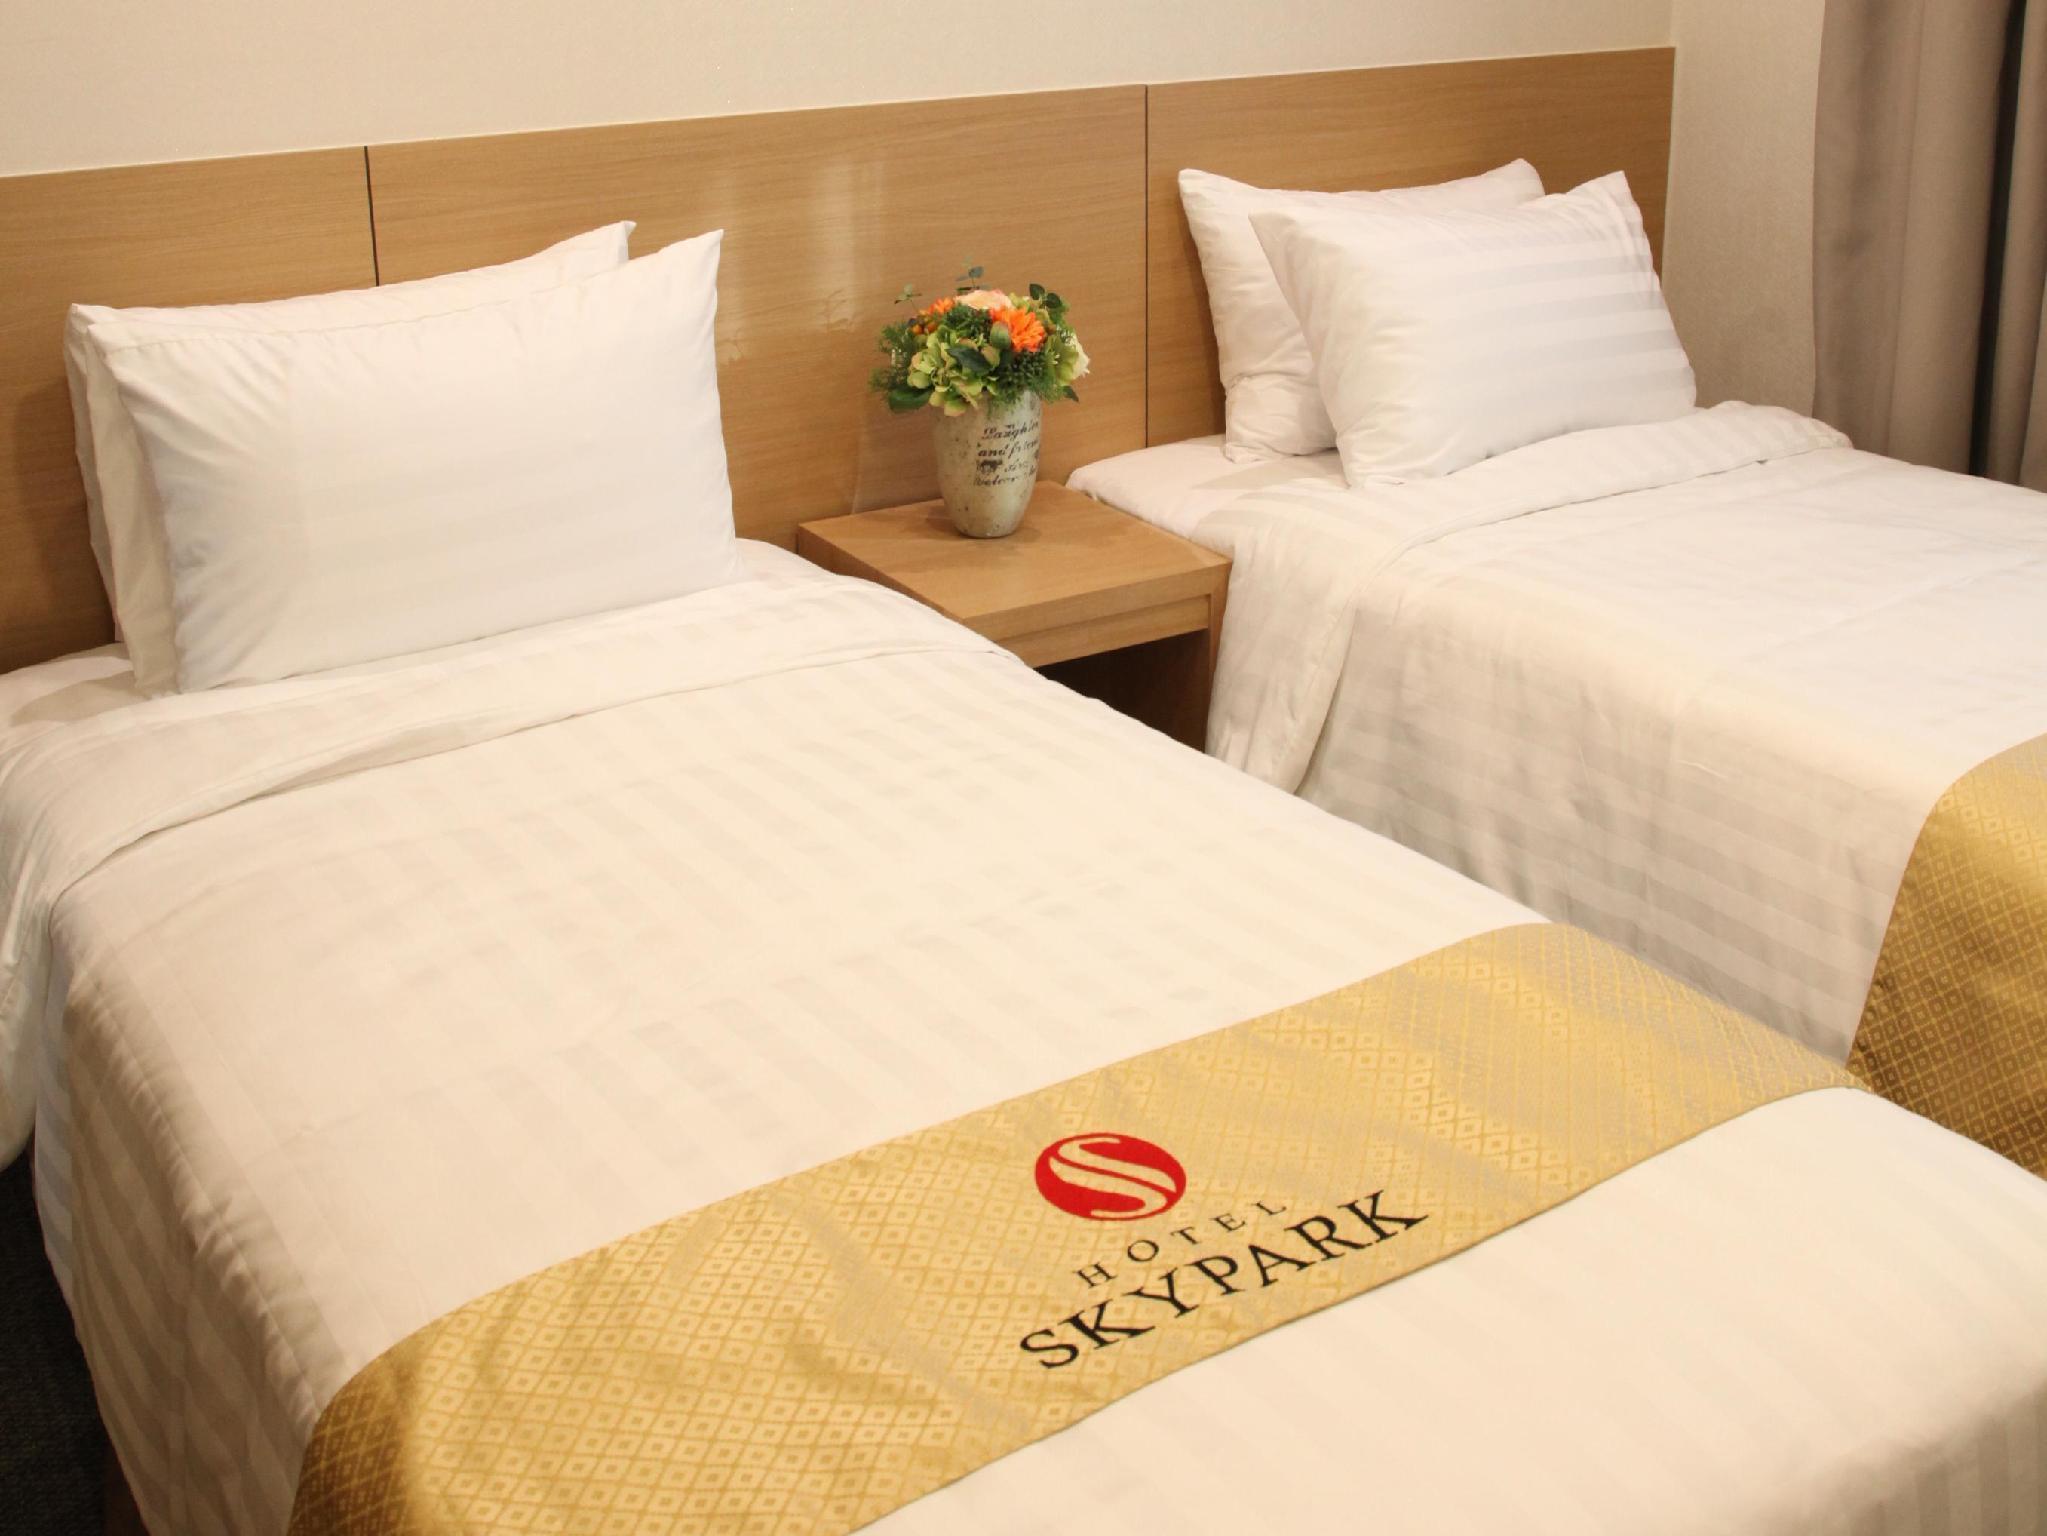 Hotel Skypark Dongdaemun I, Hotels in Seoul South Korea - The Hotels in Asia